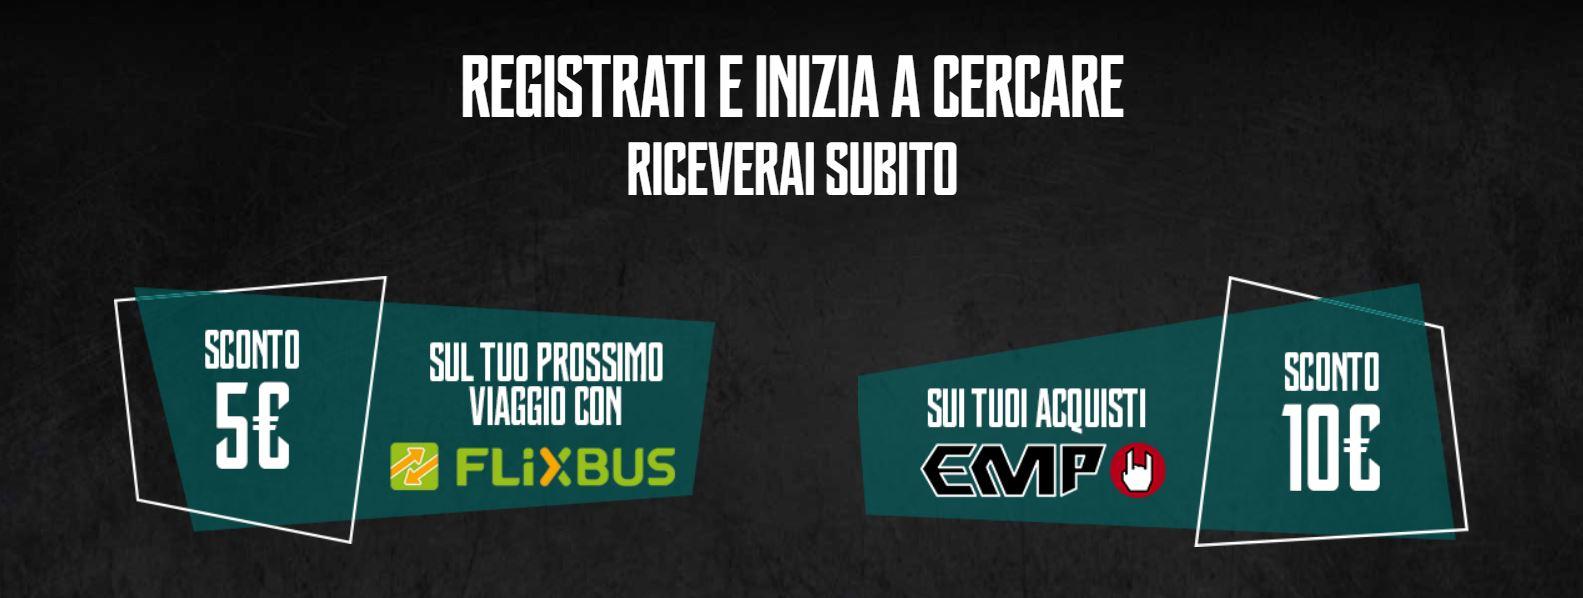 Buono sconto 5€ Flixbus